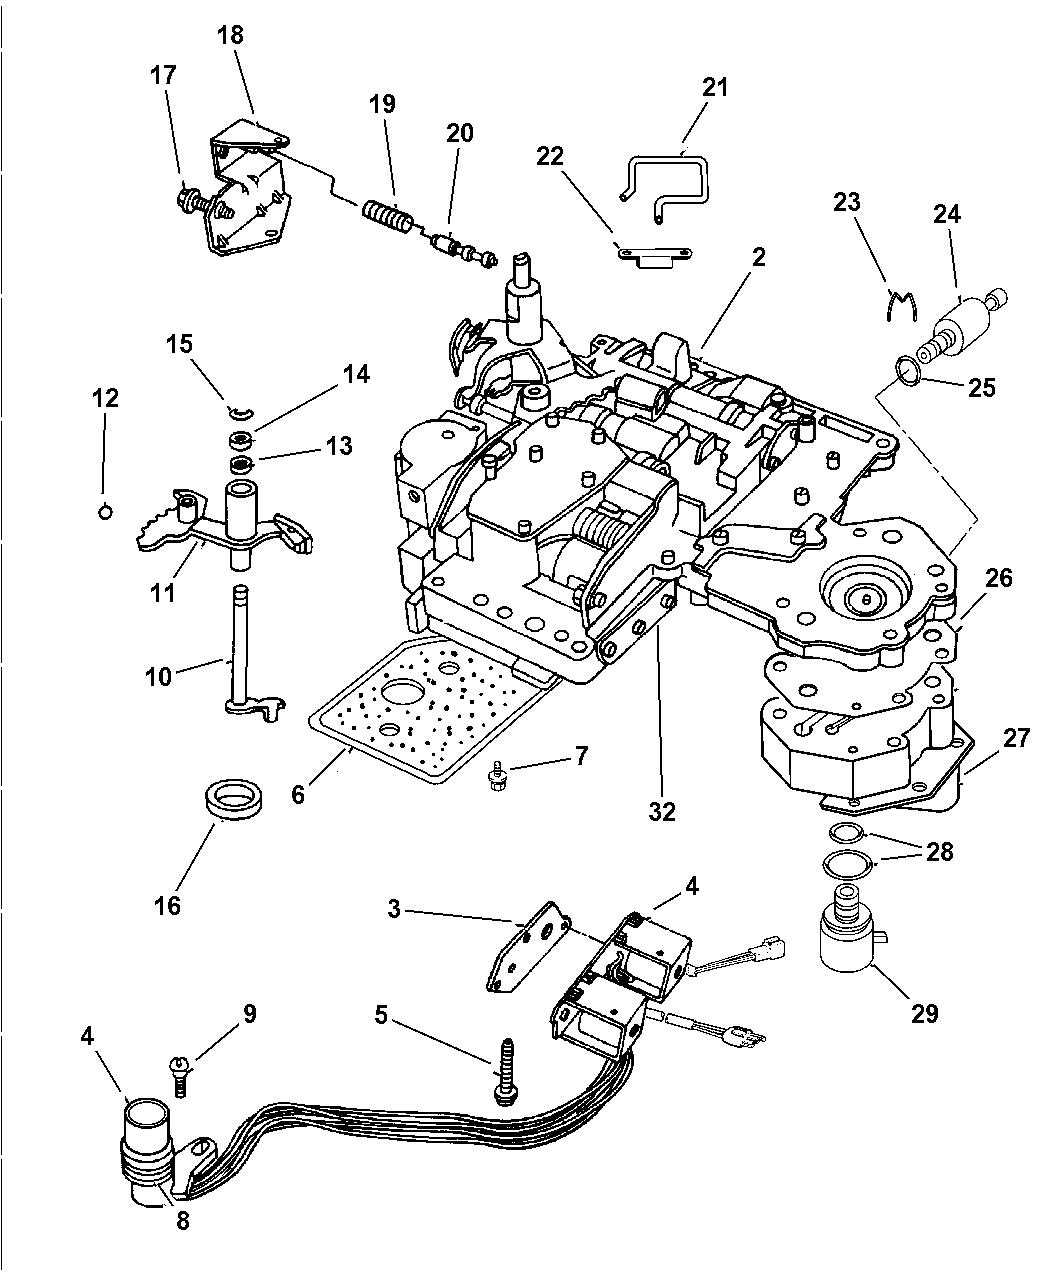 2001 dodge ram 3500 regular cab valve body mopar parts giant 48re transmission valve body breakdown 47re valve body diagram #10